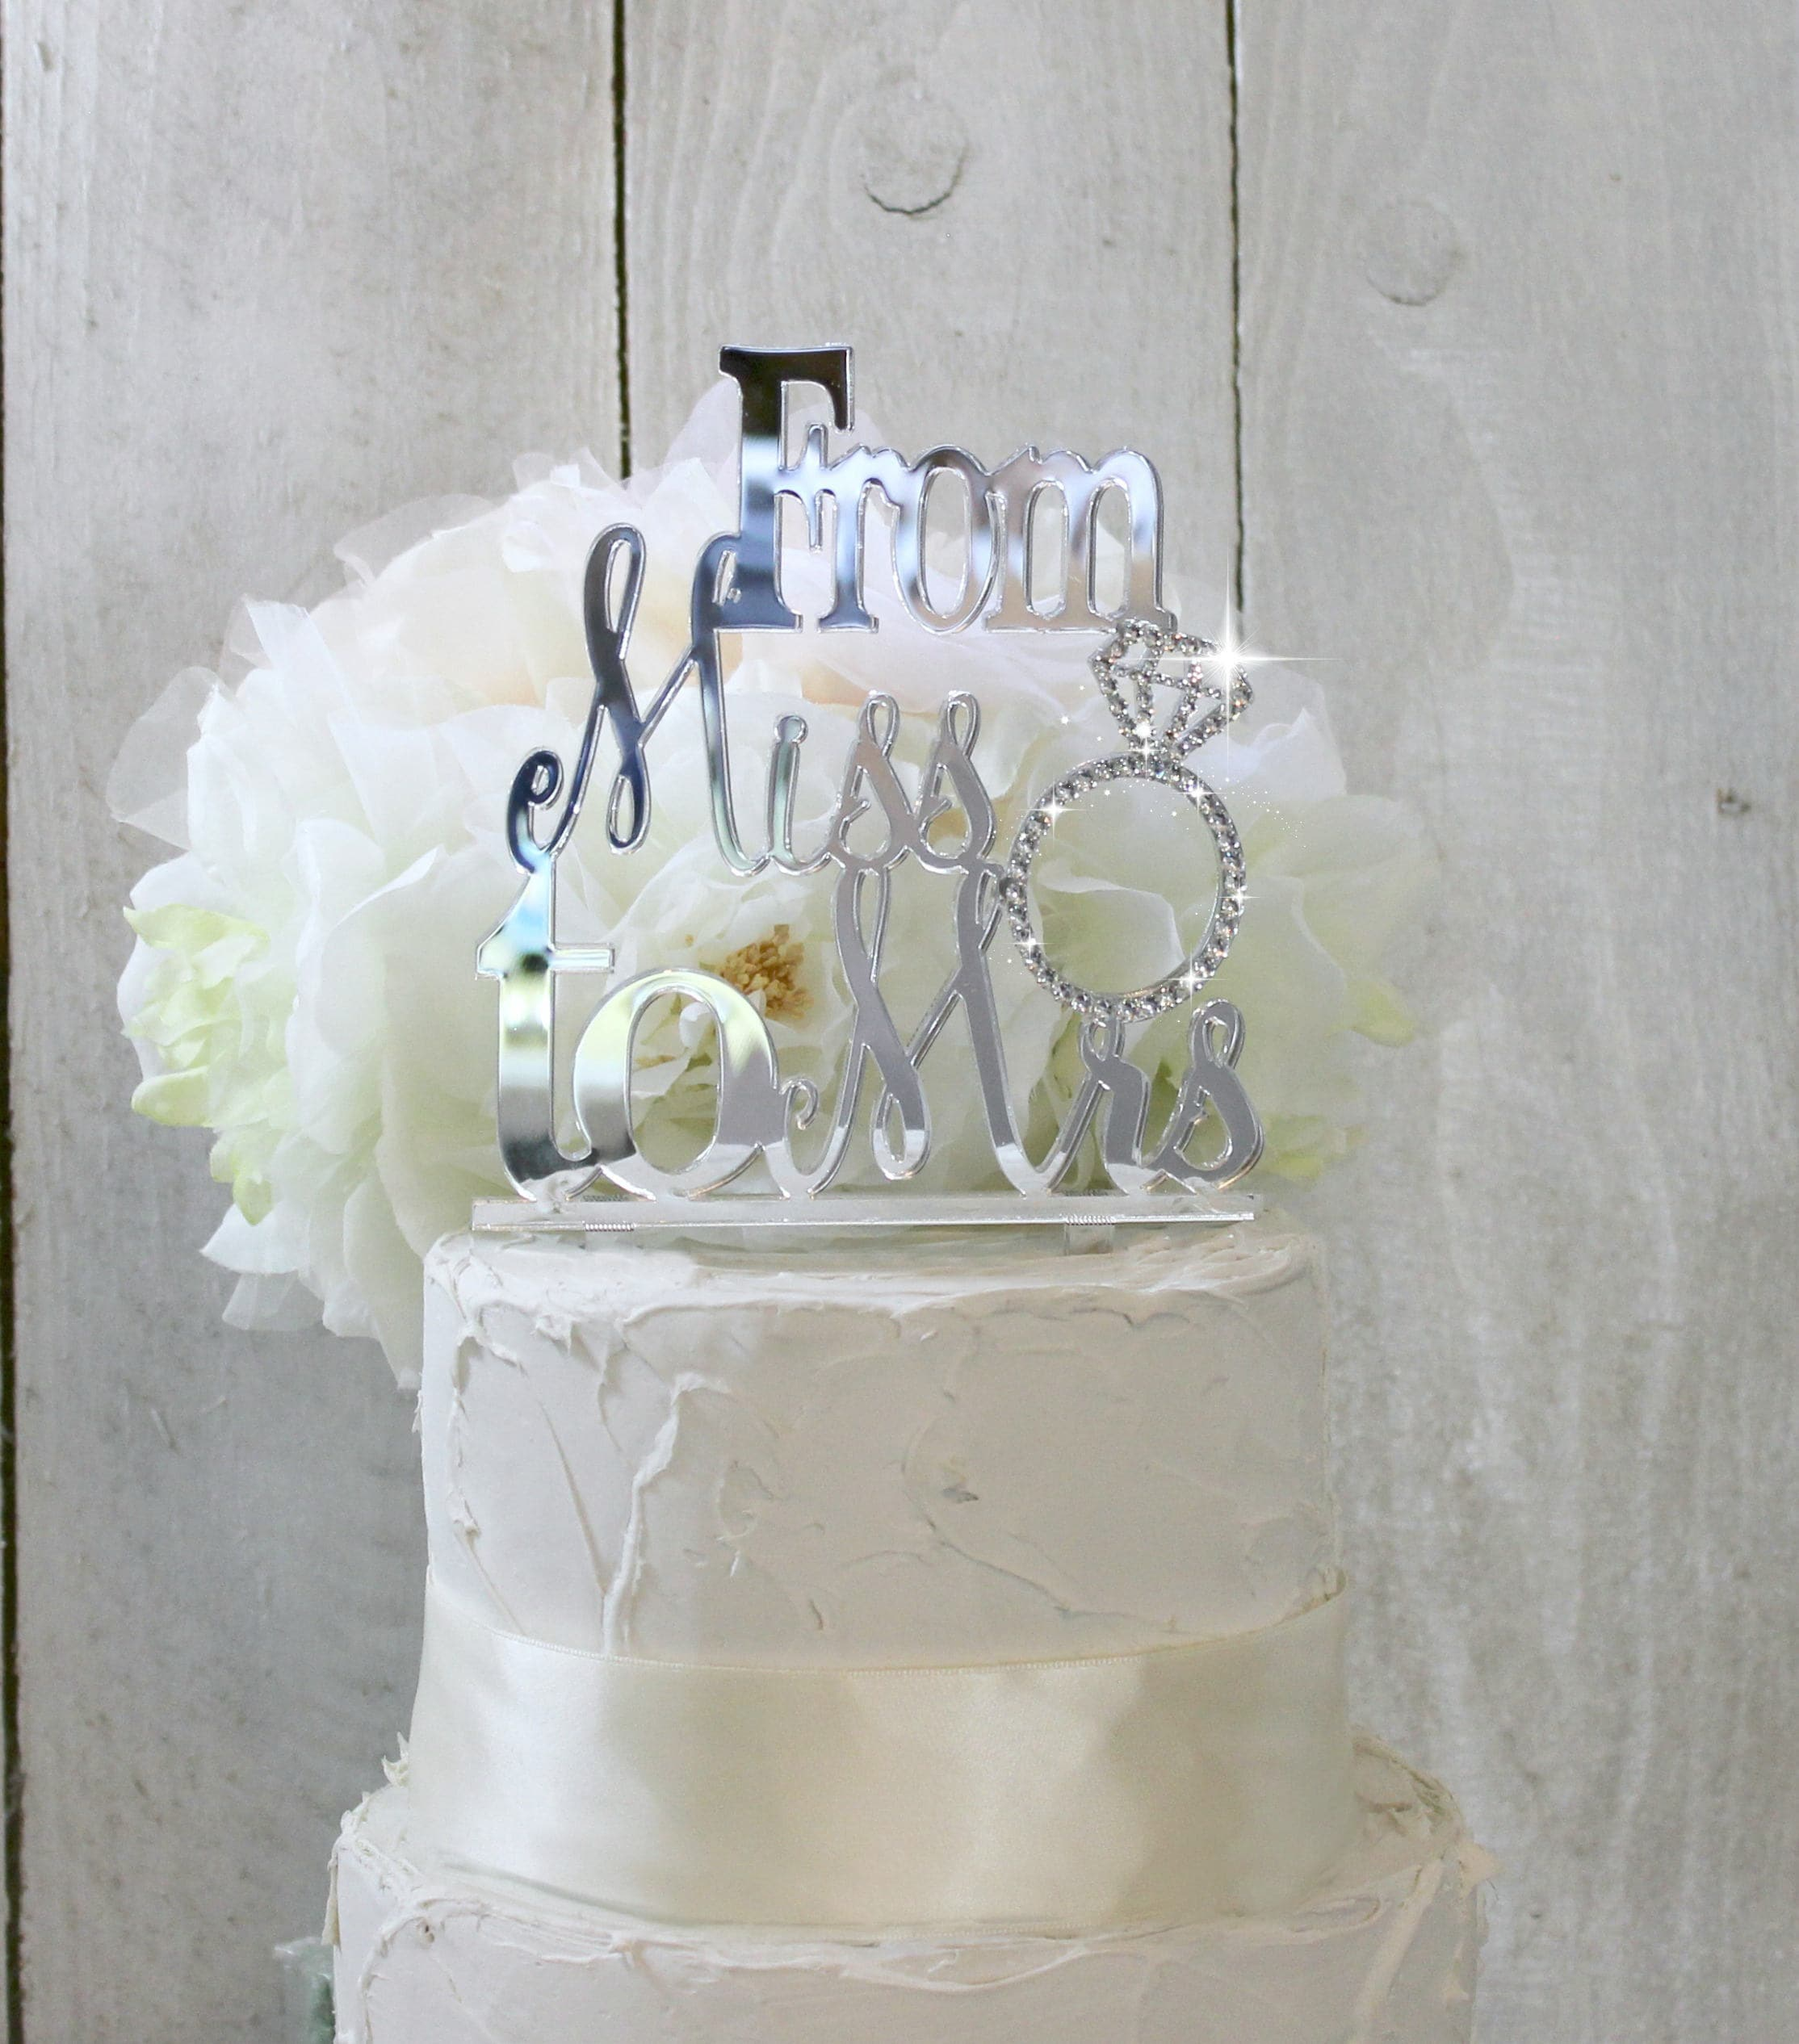 bridal shower cake toppers rhinestone bridal shower cake bling bridal shower toppers swarovski crystal bridal shower cake quick ship